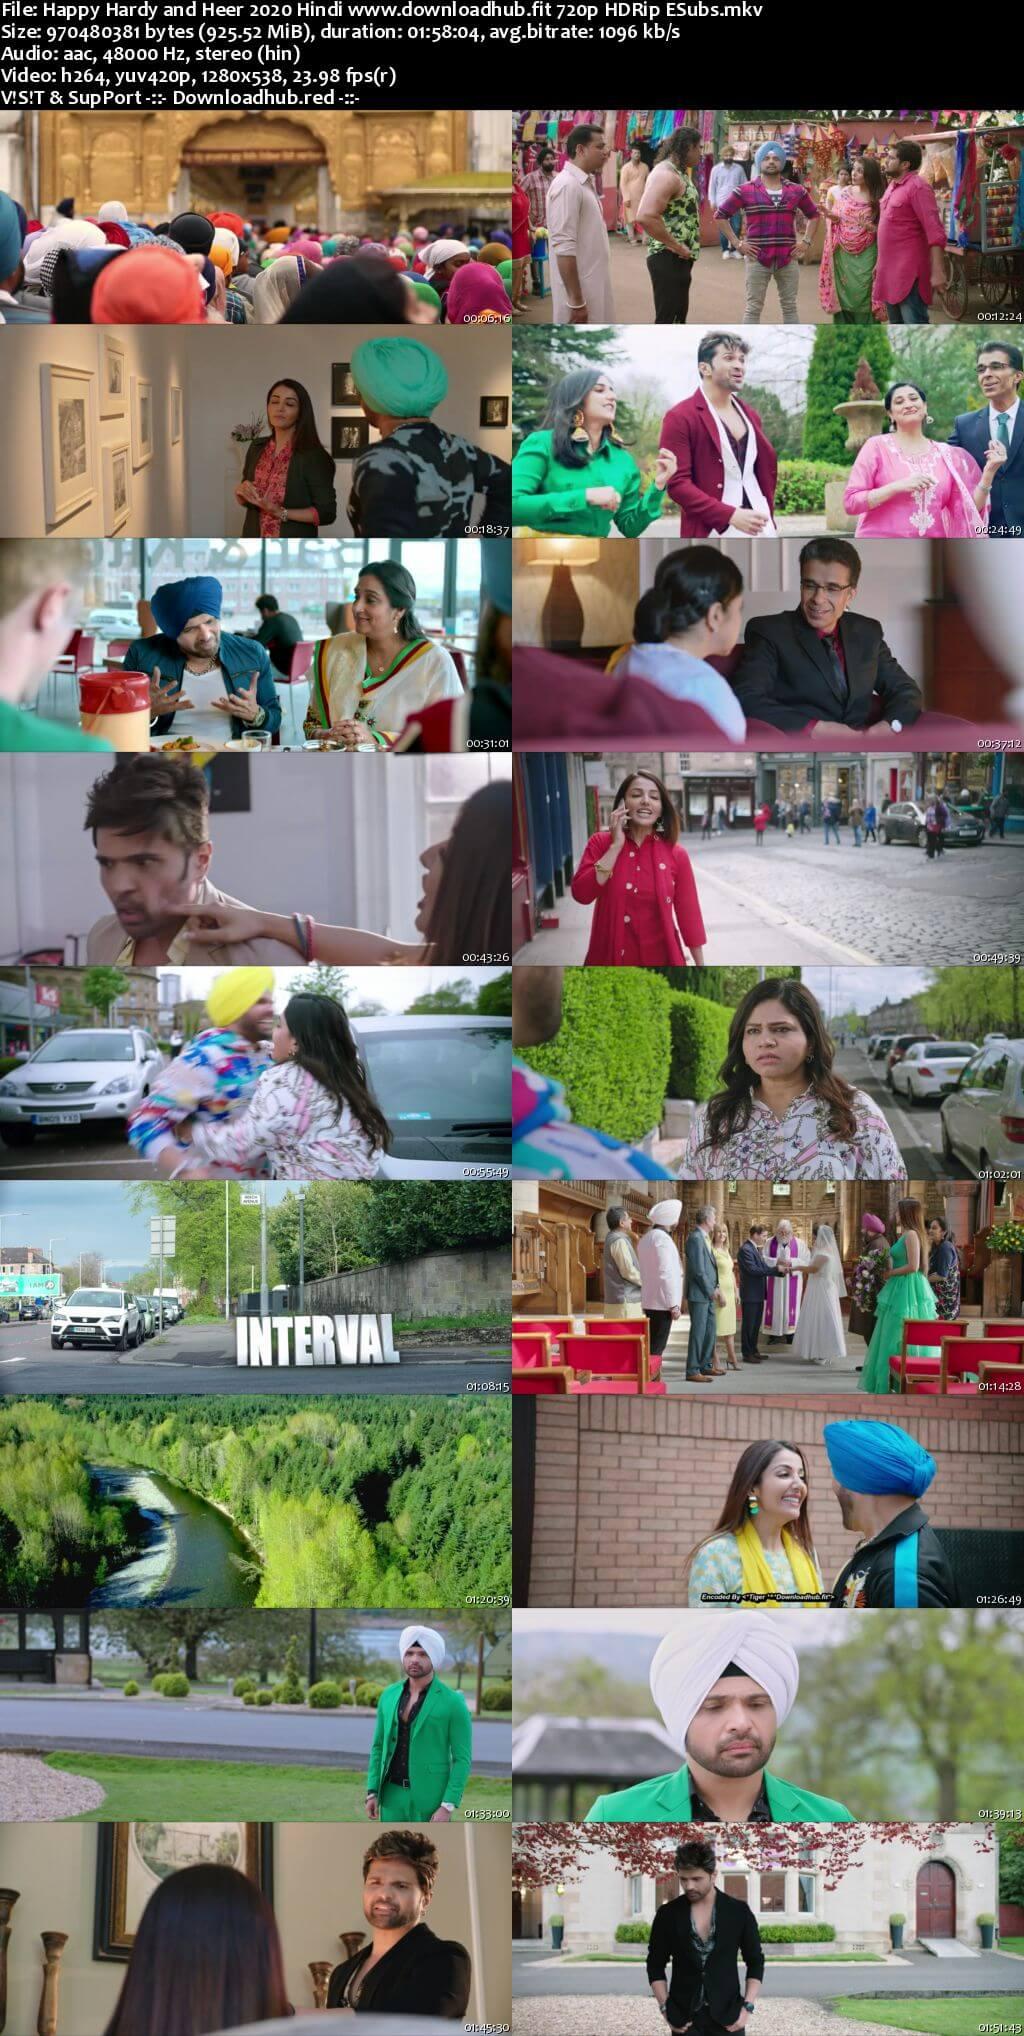 Happy Hardy and Heer 2020 Hindi 720p HDRip ESubs